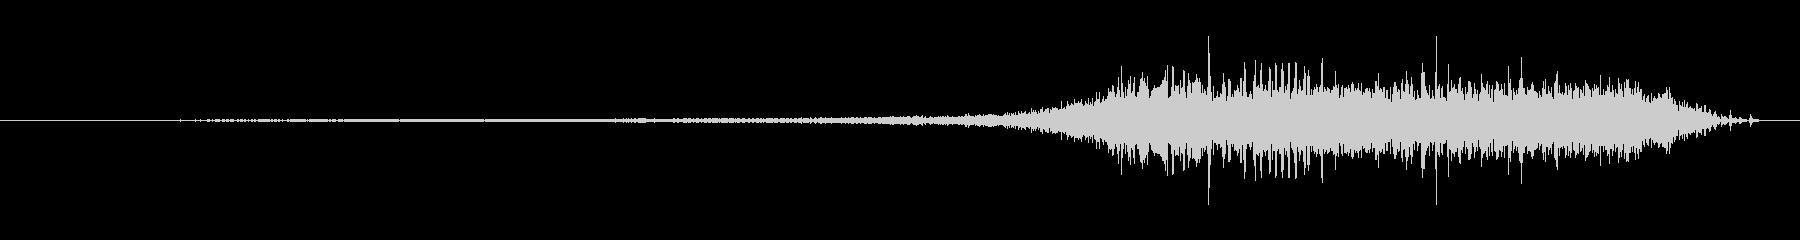 POLARIS 440:サイドにプ...の未再生の波形